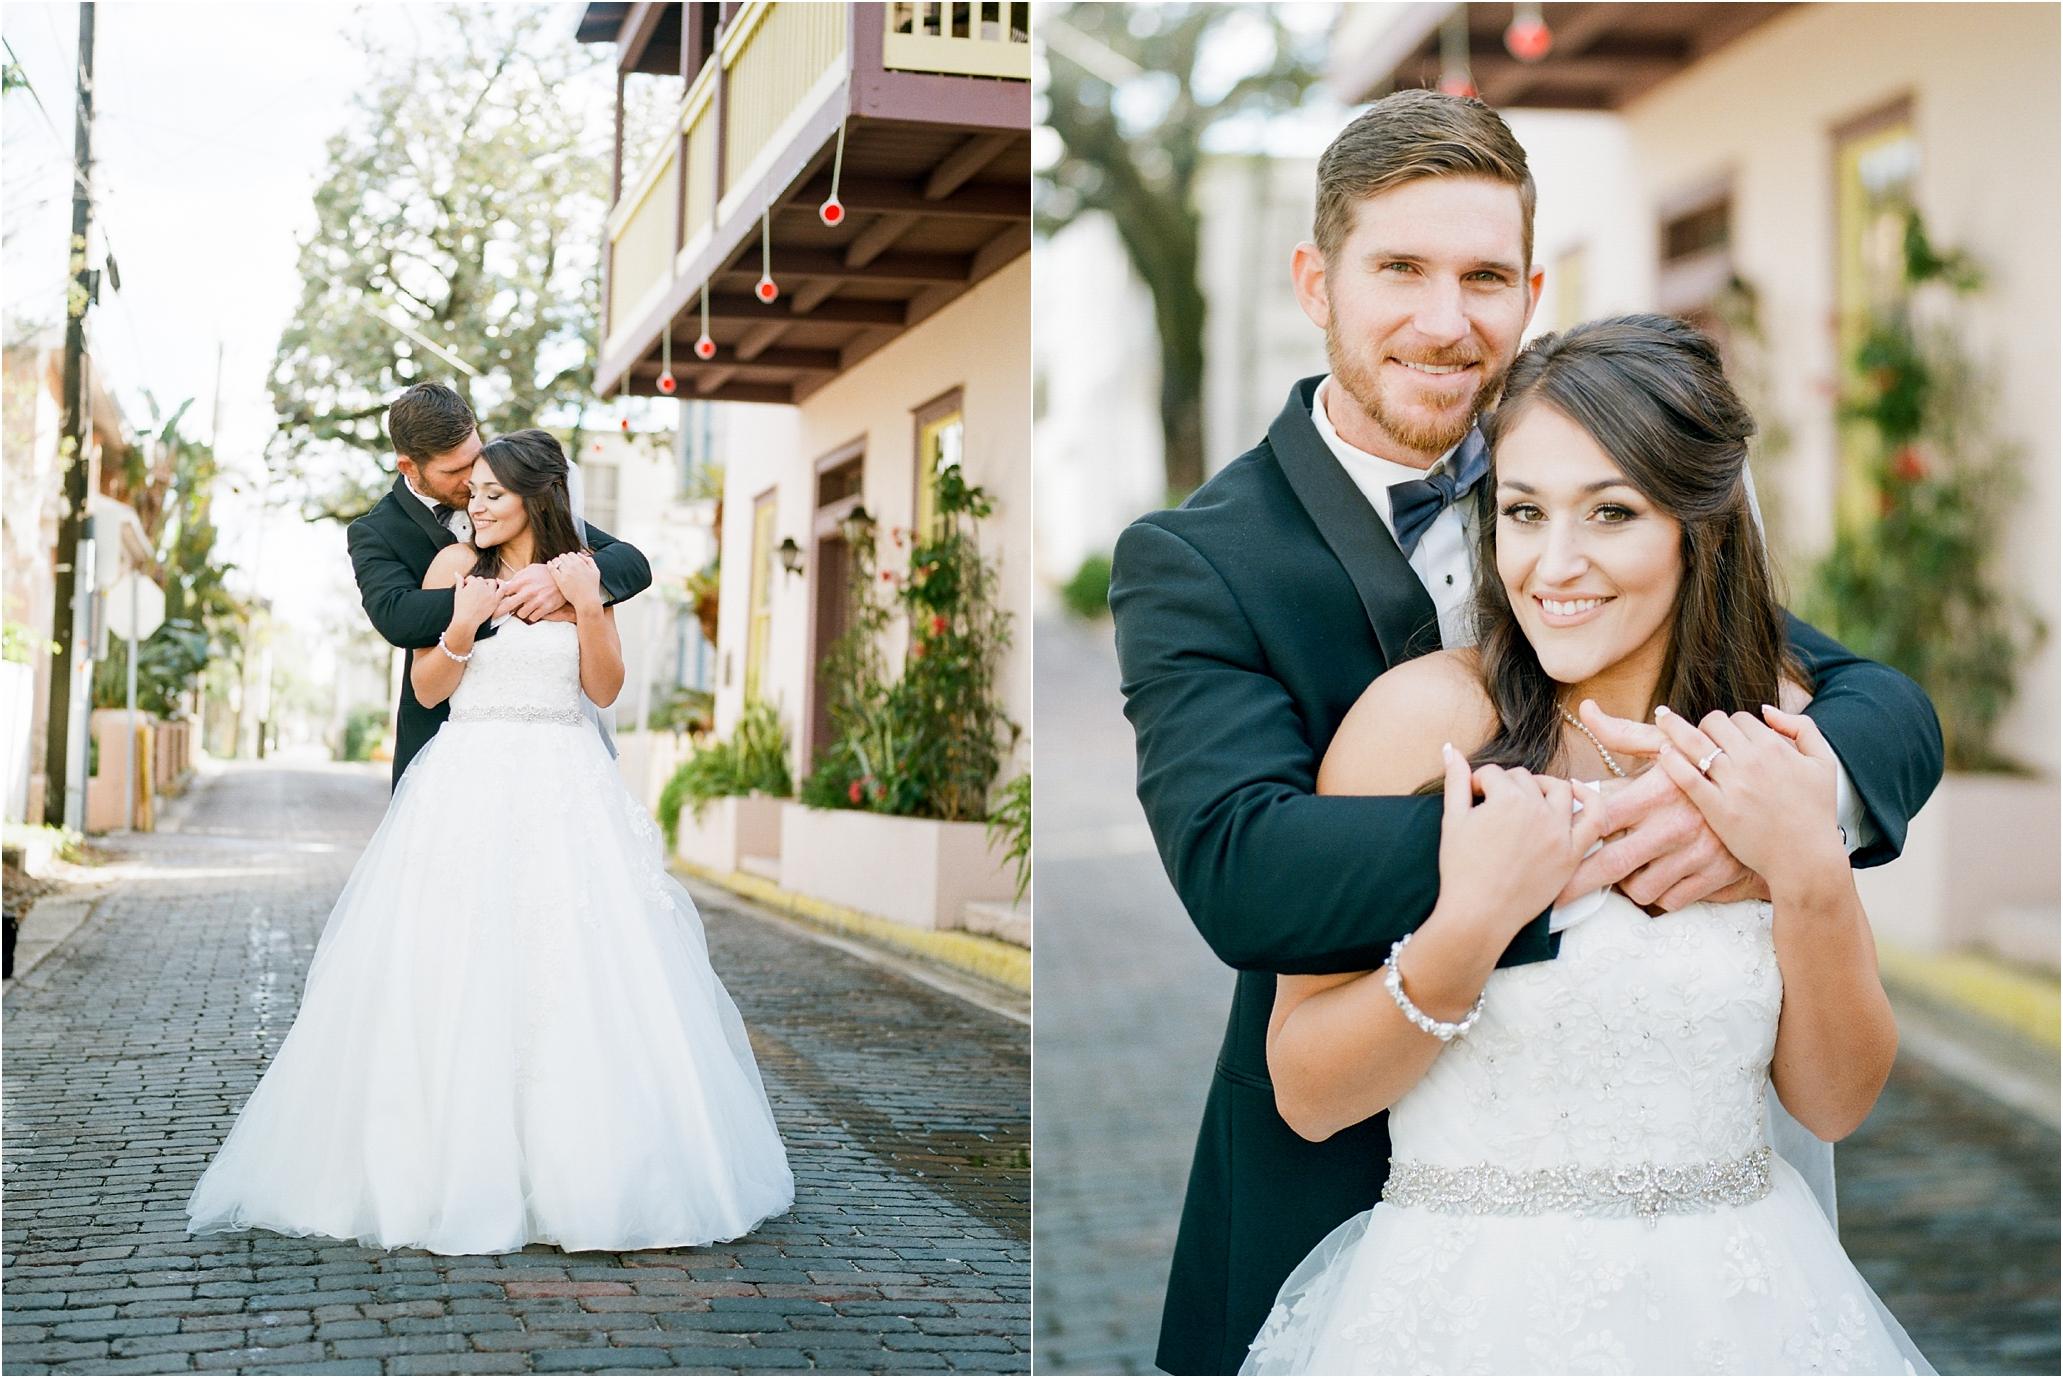 Lisa Silva Photography- Ponte Vedra Beach and Jacksonville, Florida Fine Art Film Wedding Photography- Wedding at The White Room Villa Blanca in St. Augustine, Florida_0039.jpg